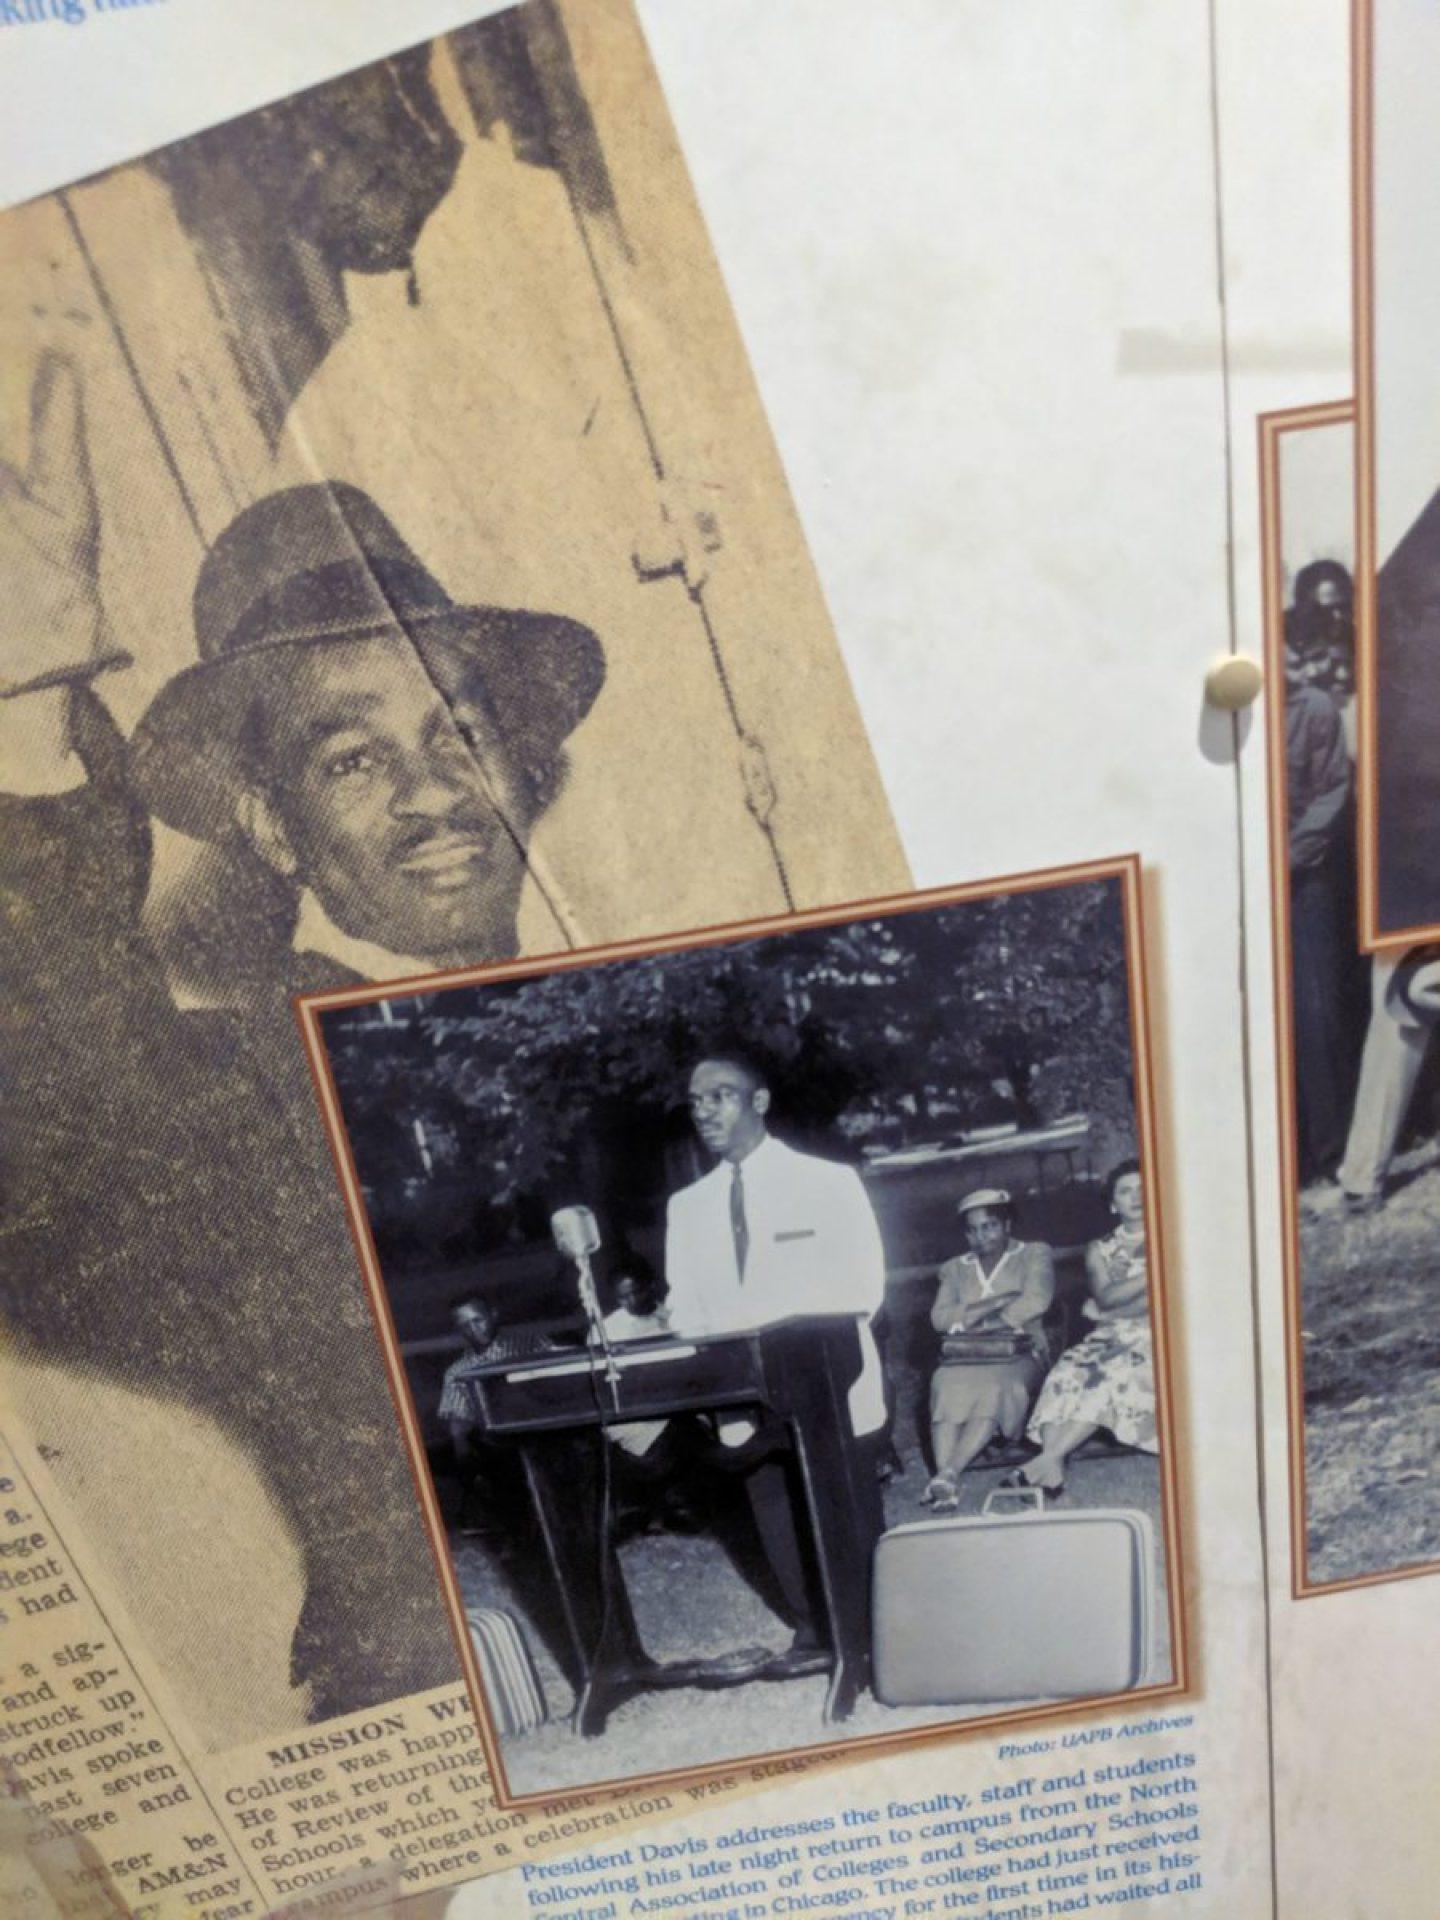 IMG_20190503_161040-1440x1920 Arkansas Delta Family Road Trip:  Black Heritage, Art & More!